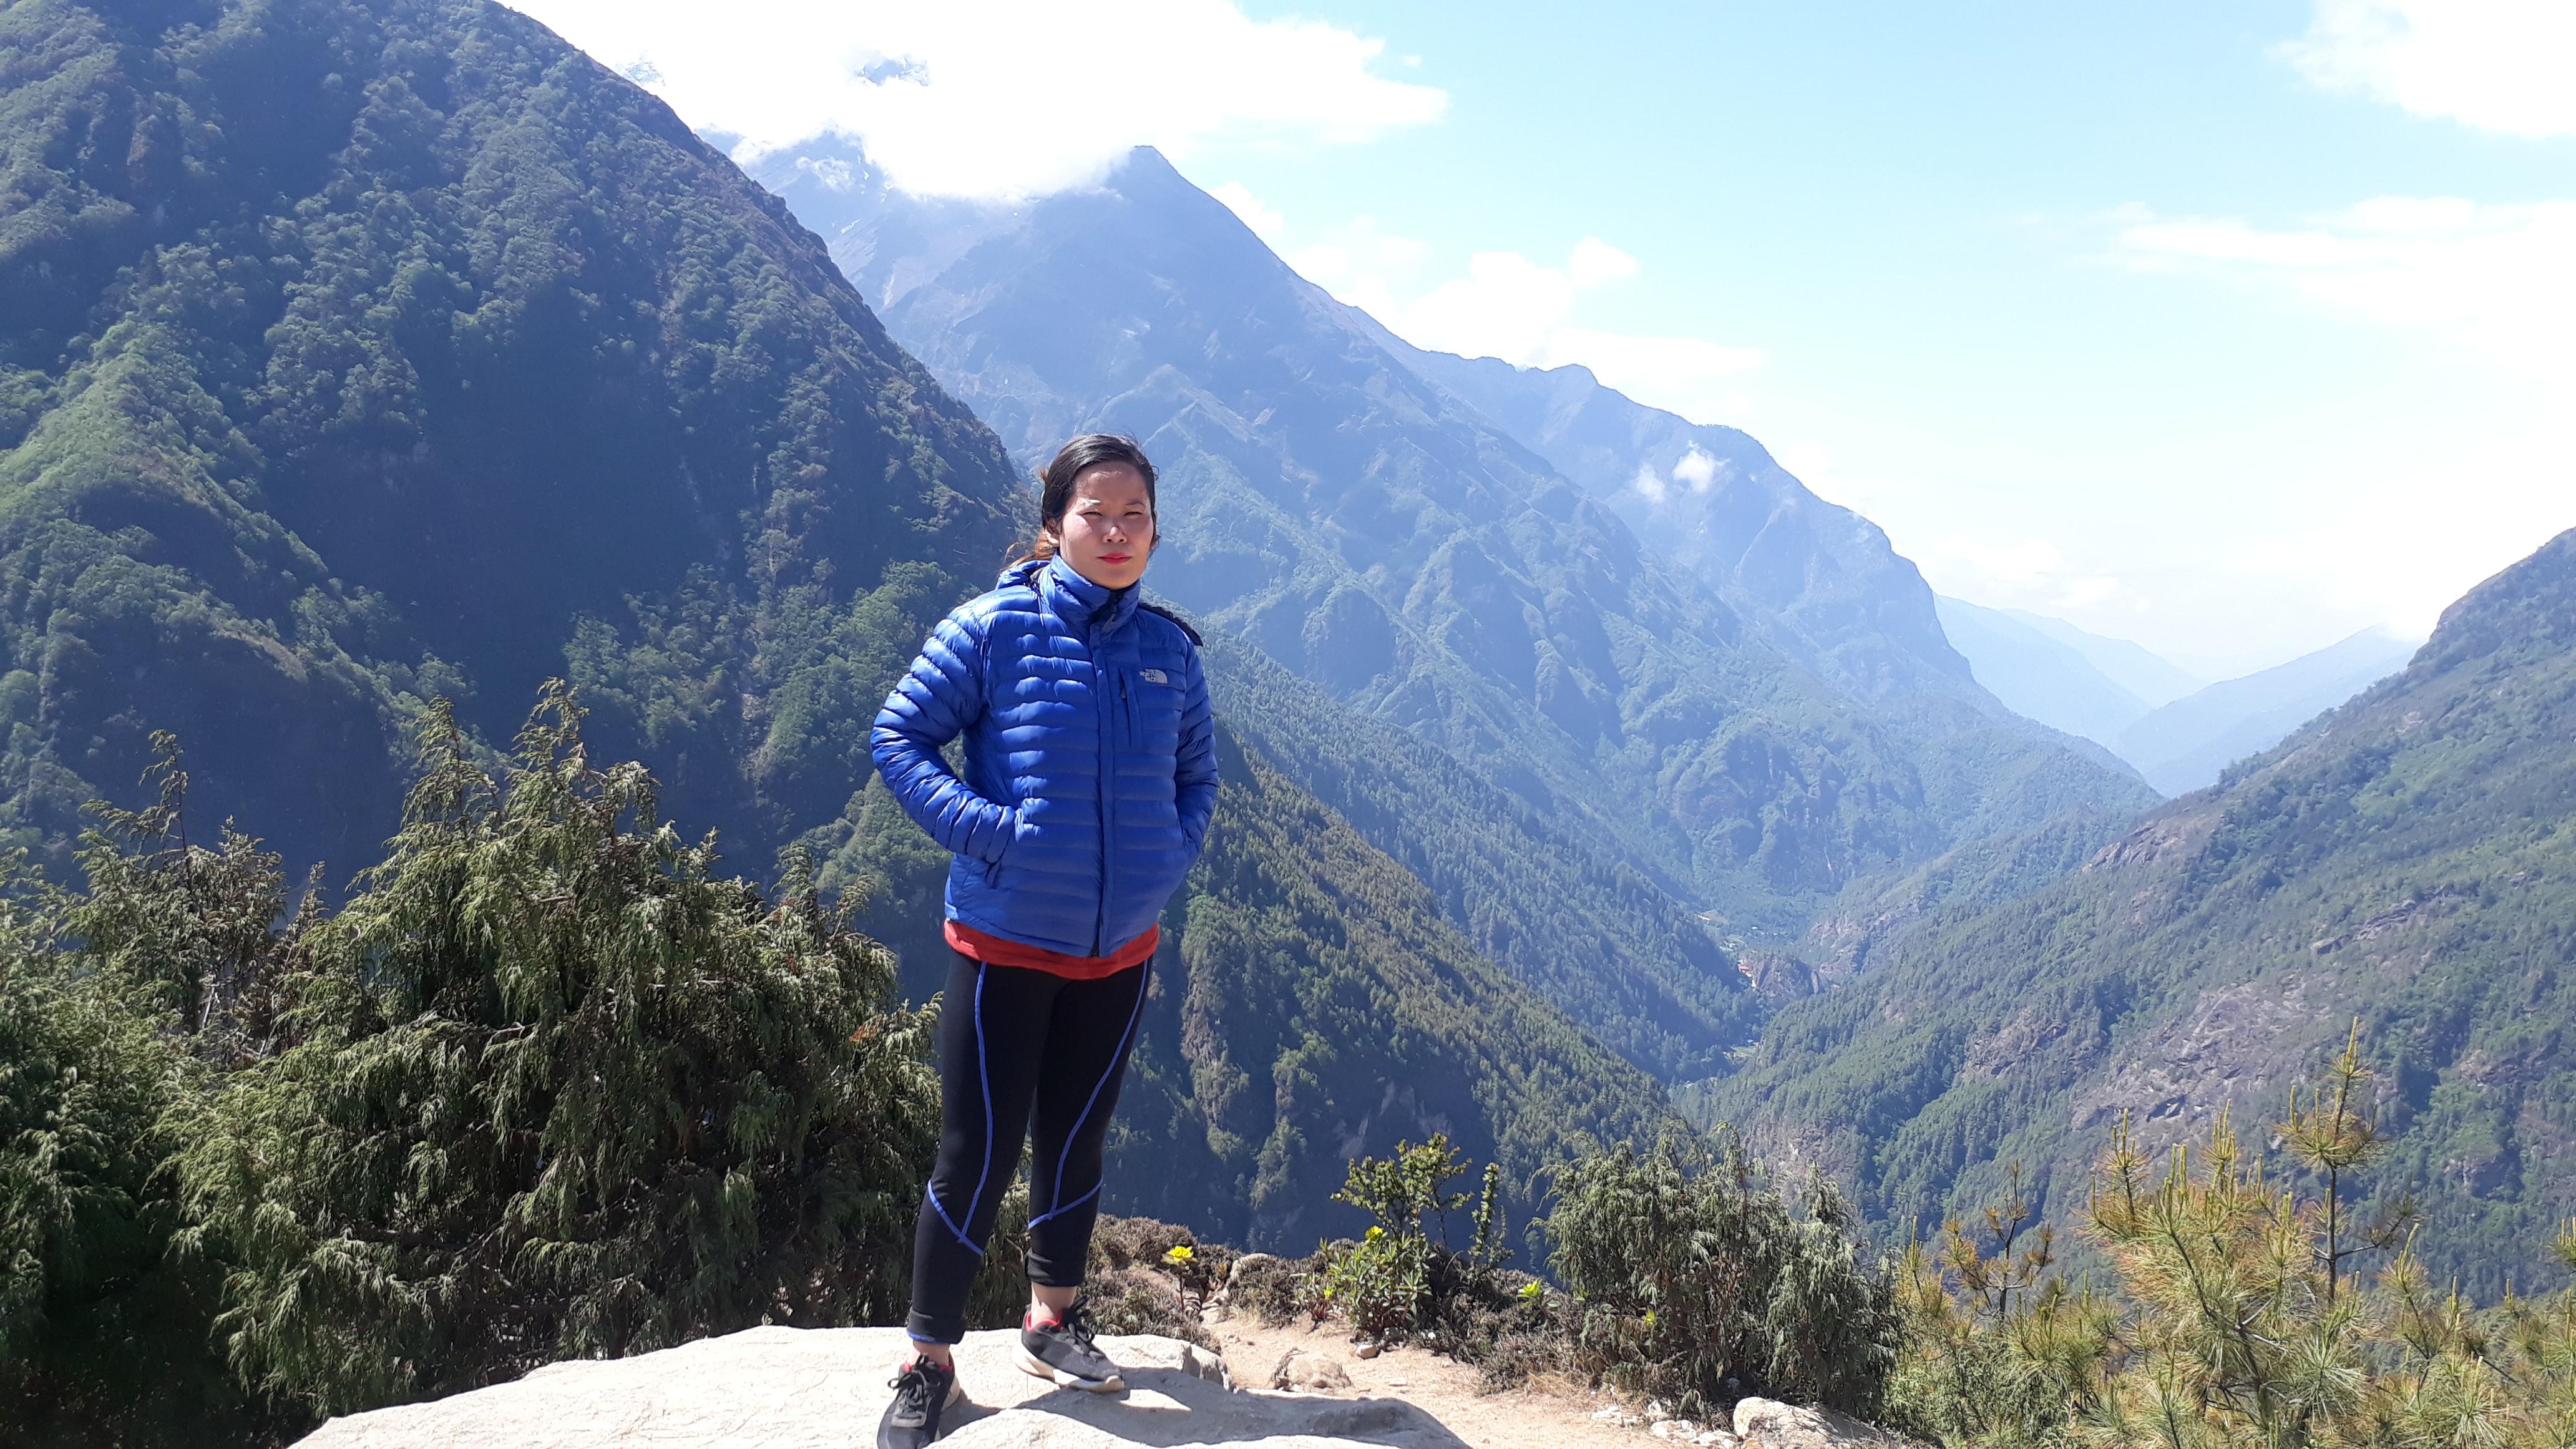 Female Mulde Hill Trekking Guide